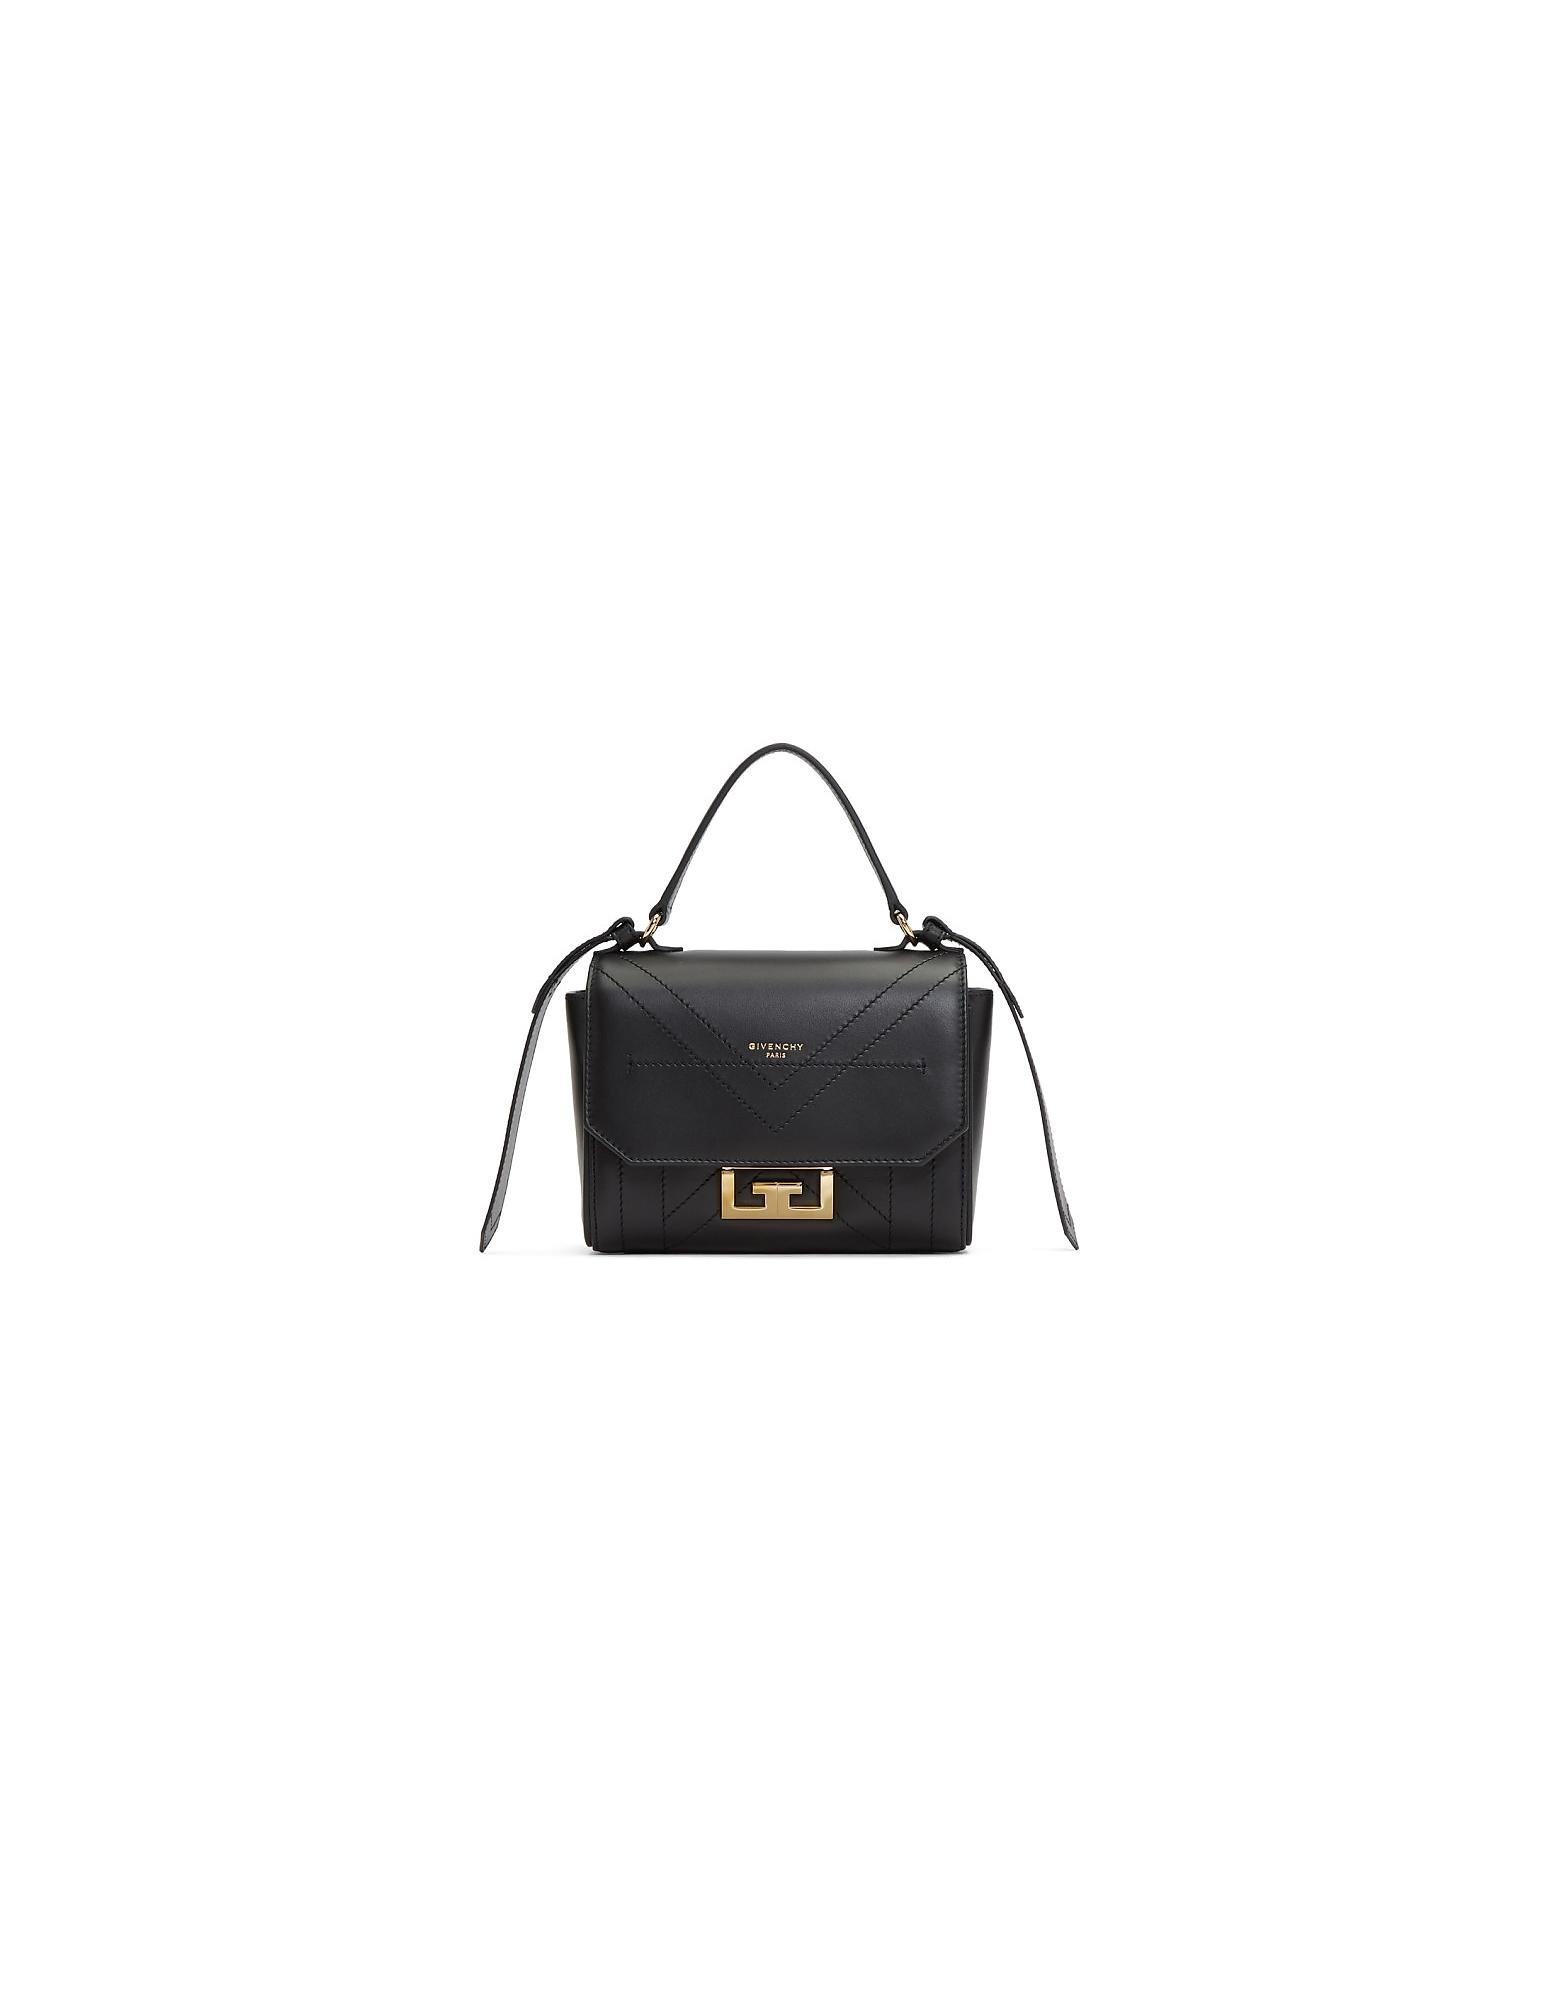 Givenchy Tops BLACK MINI EDEN BAG